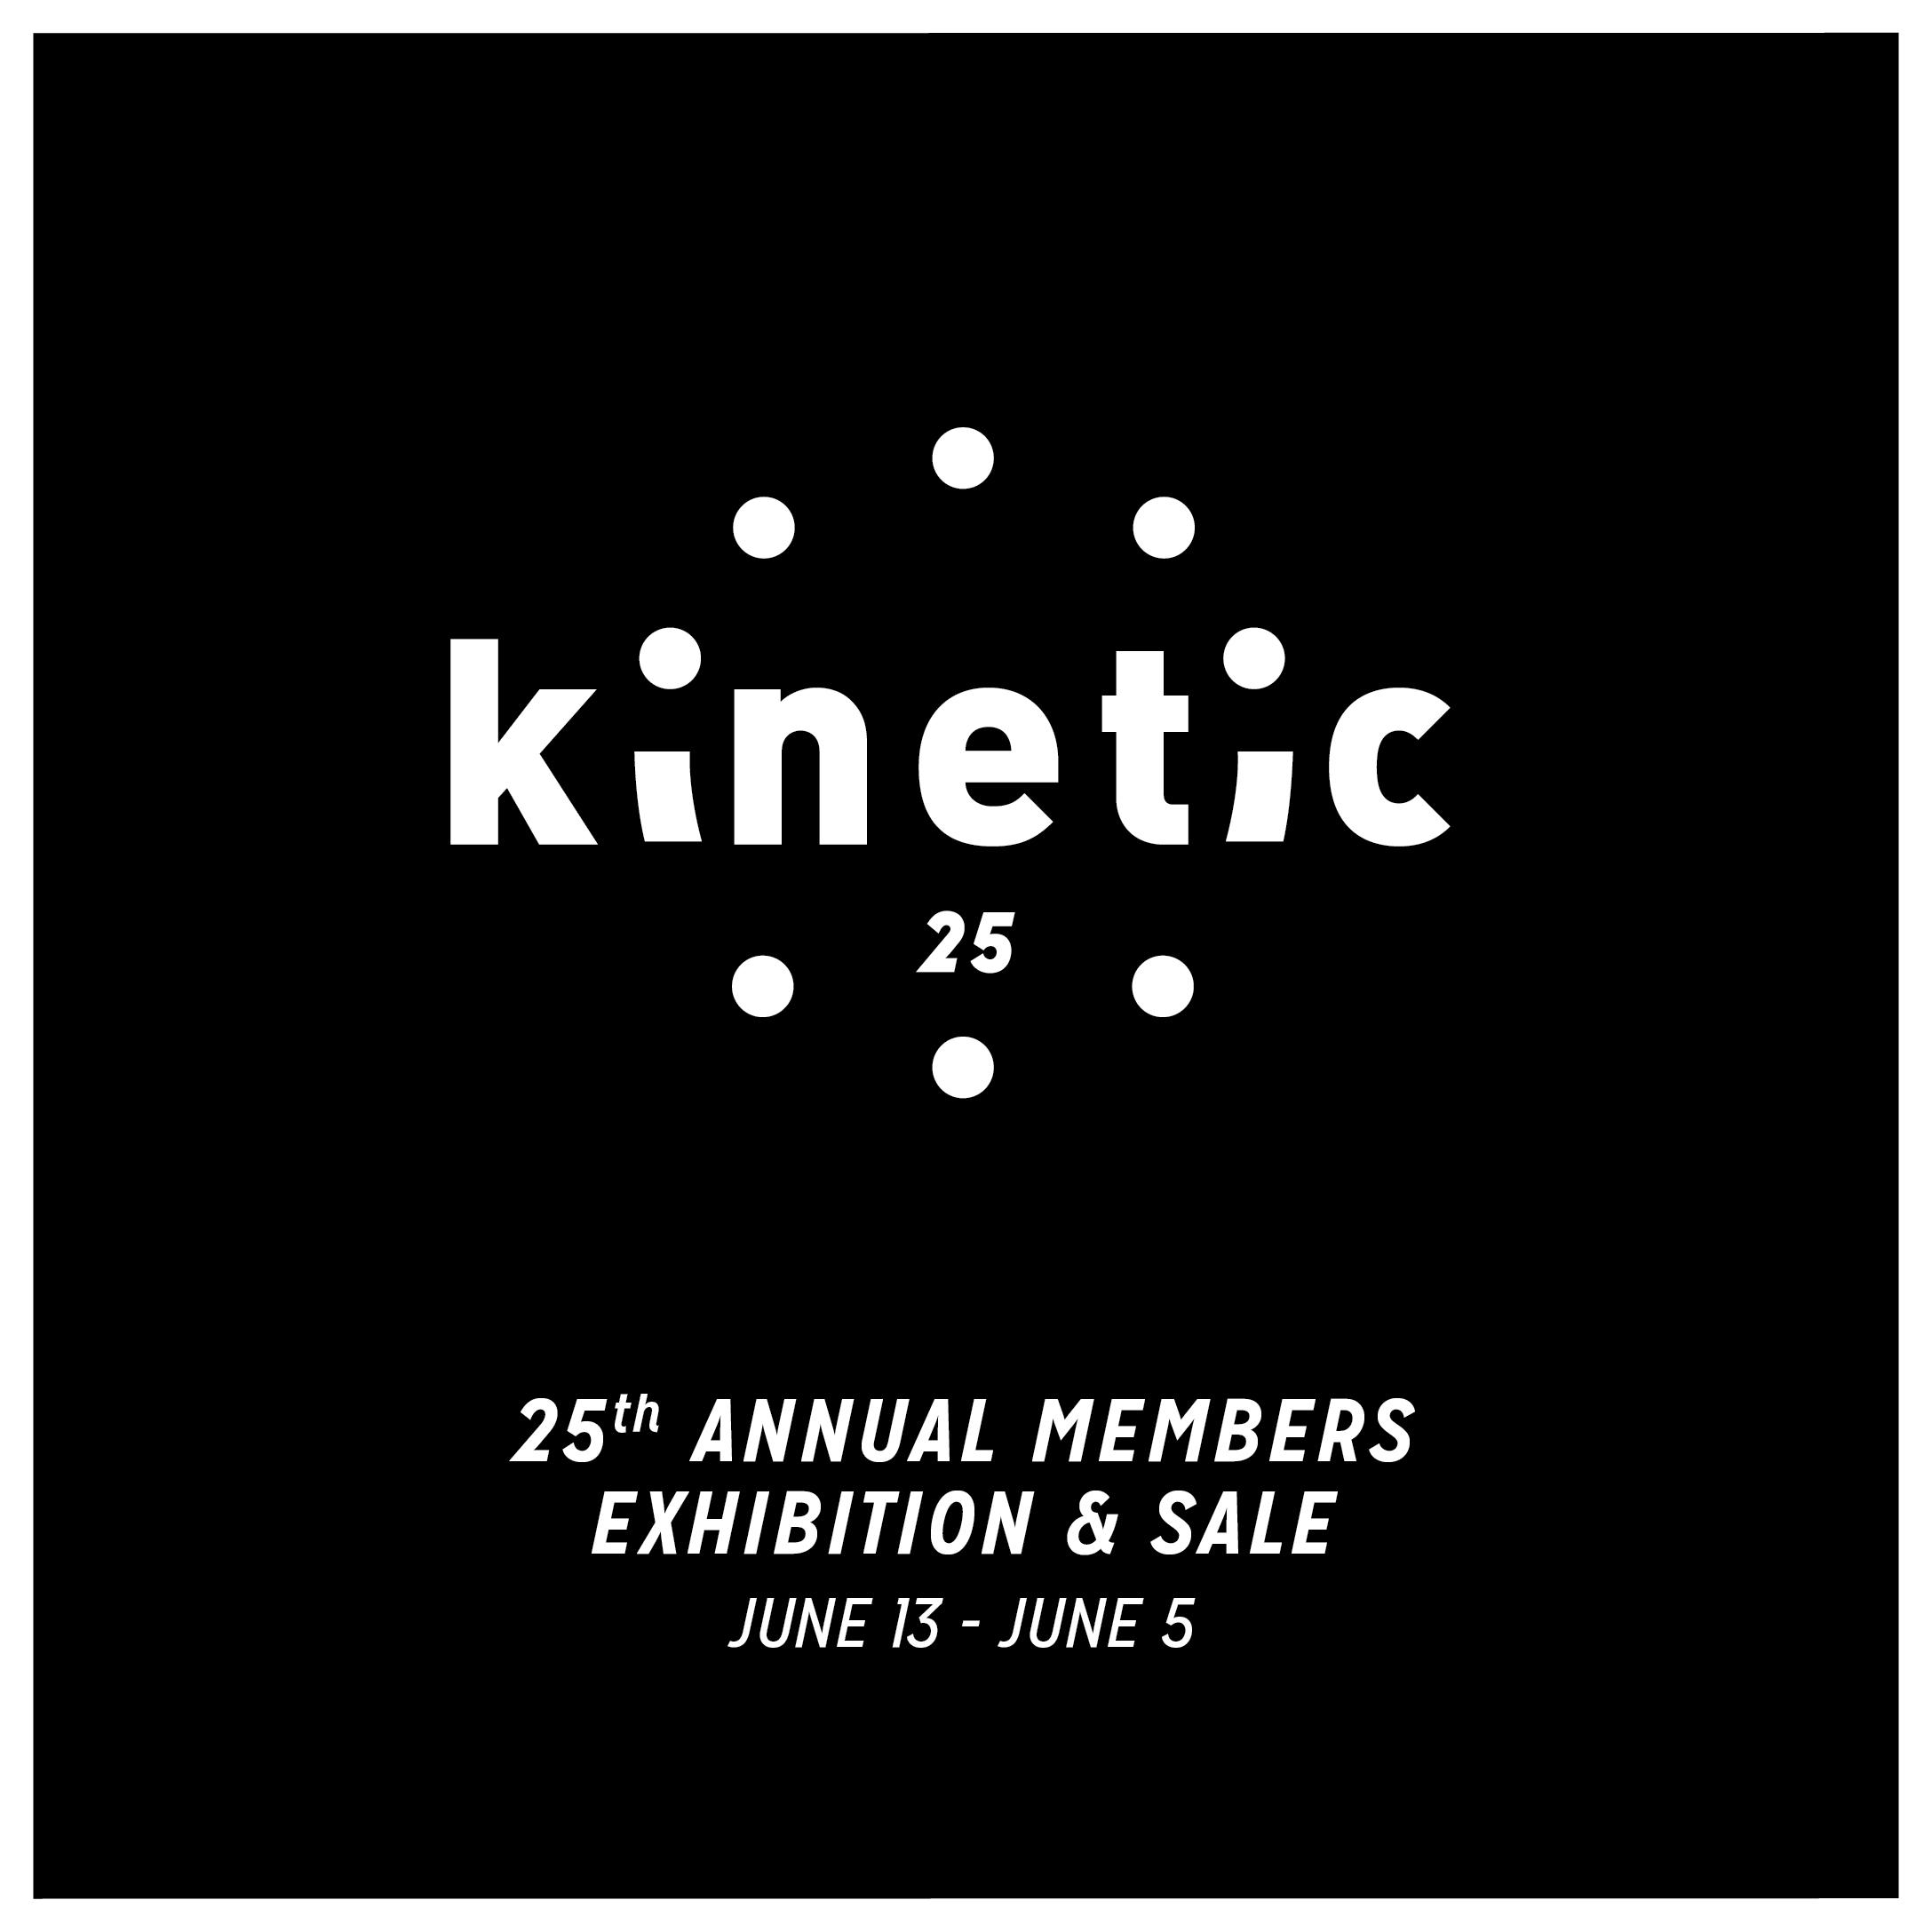 Kinetic_the works_B&W-06.jpg